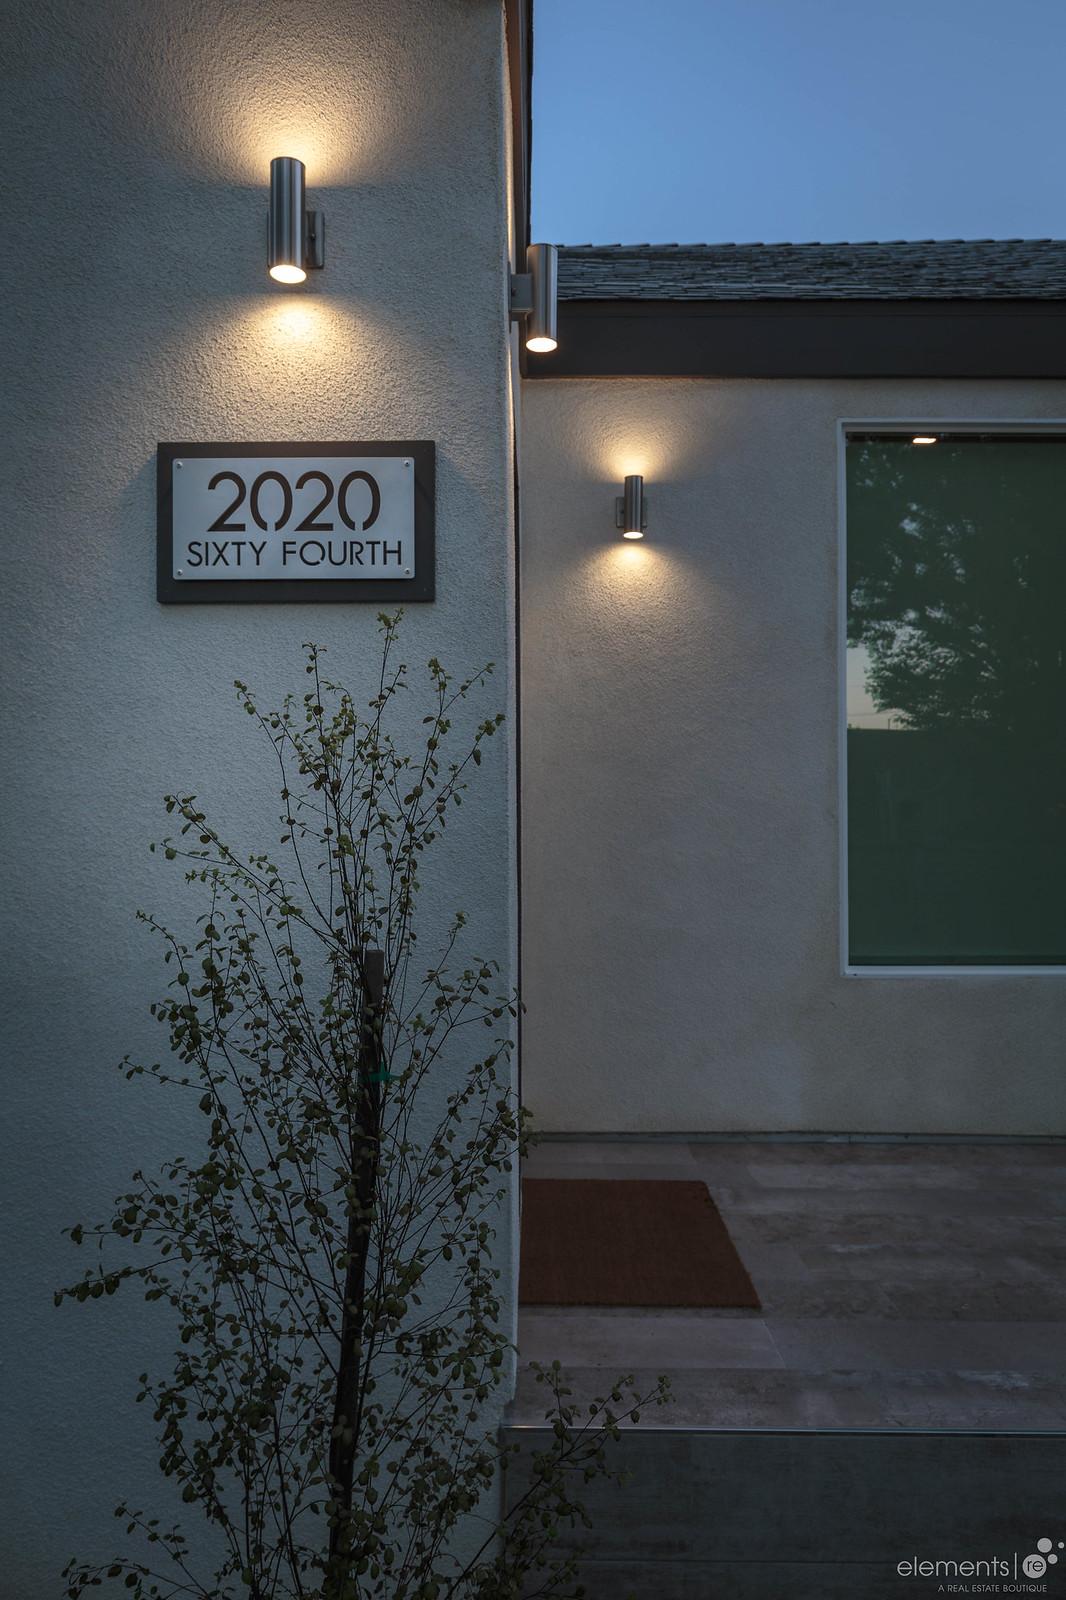 2020 ^4th-7